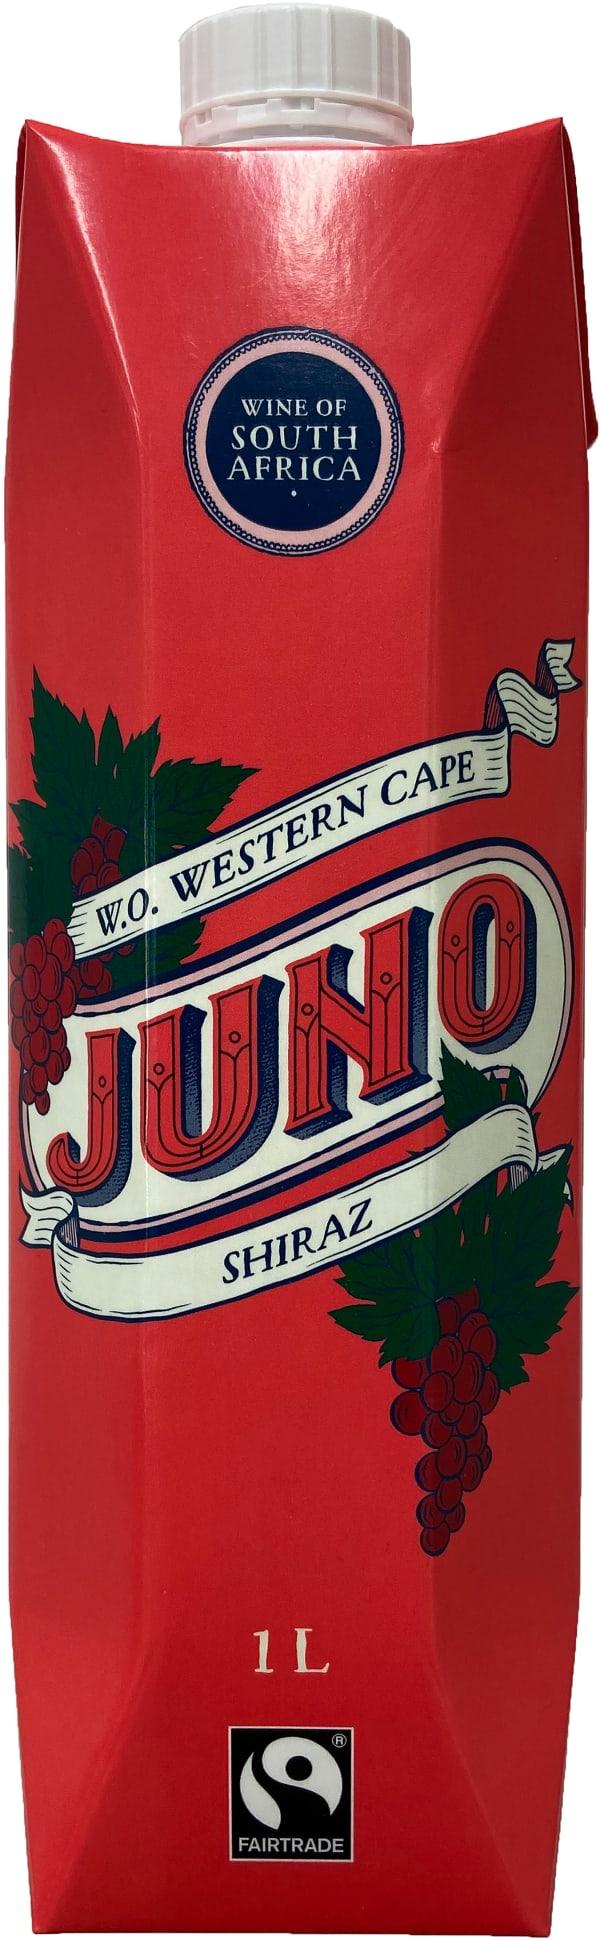 Juno Shiraz 2016 kartongförpackning